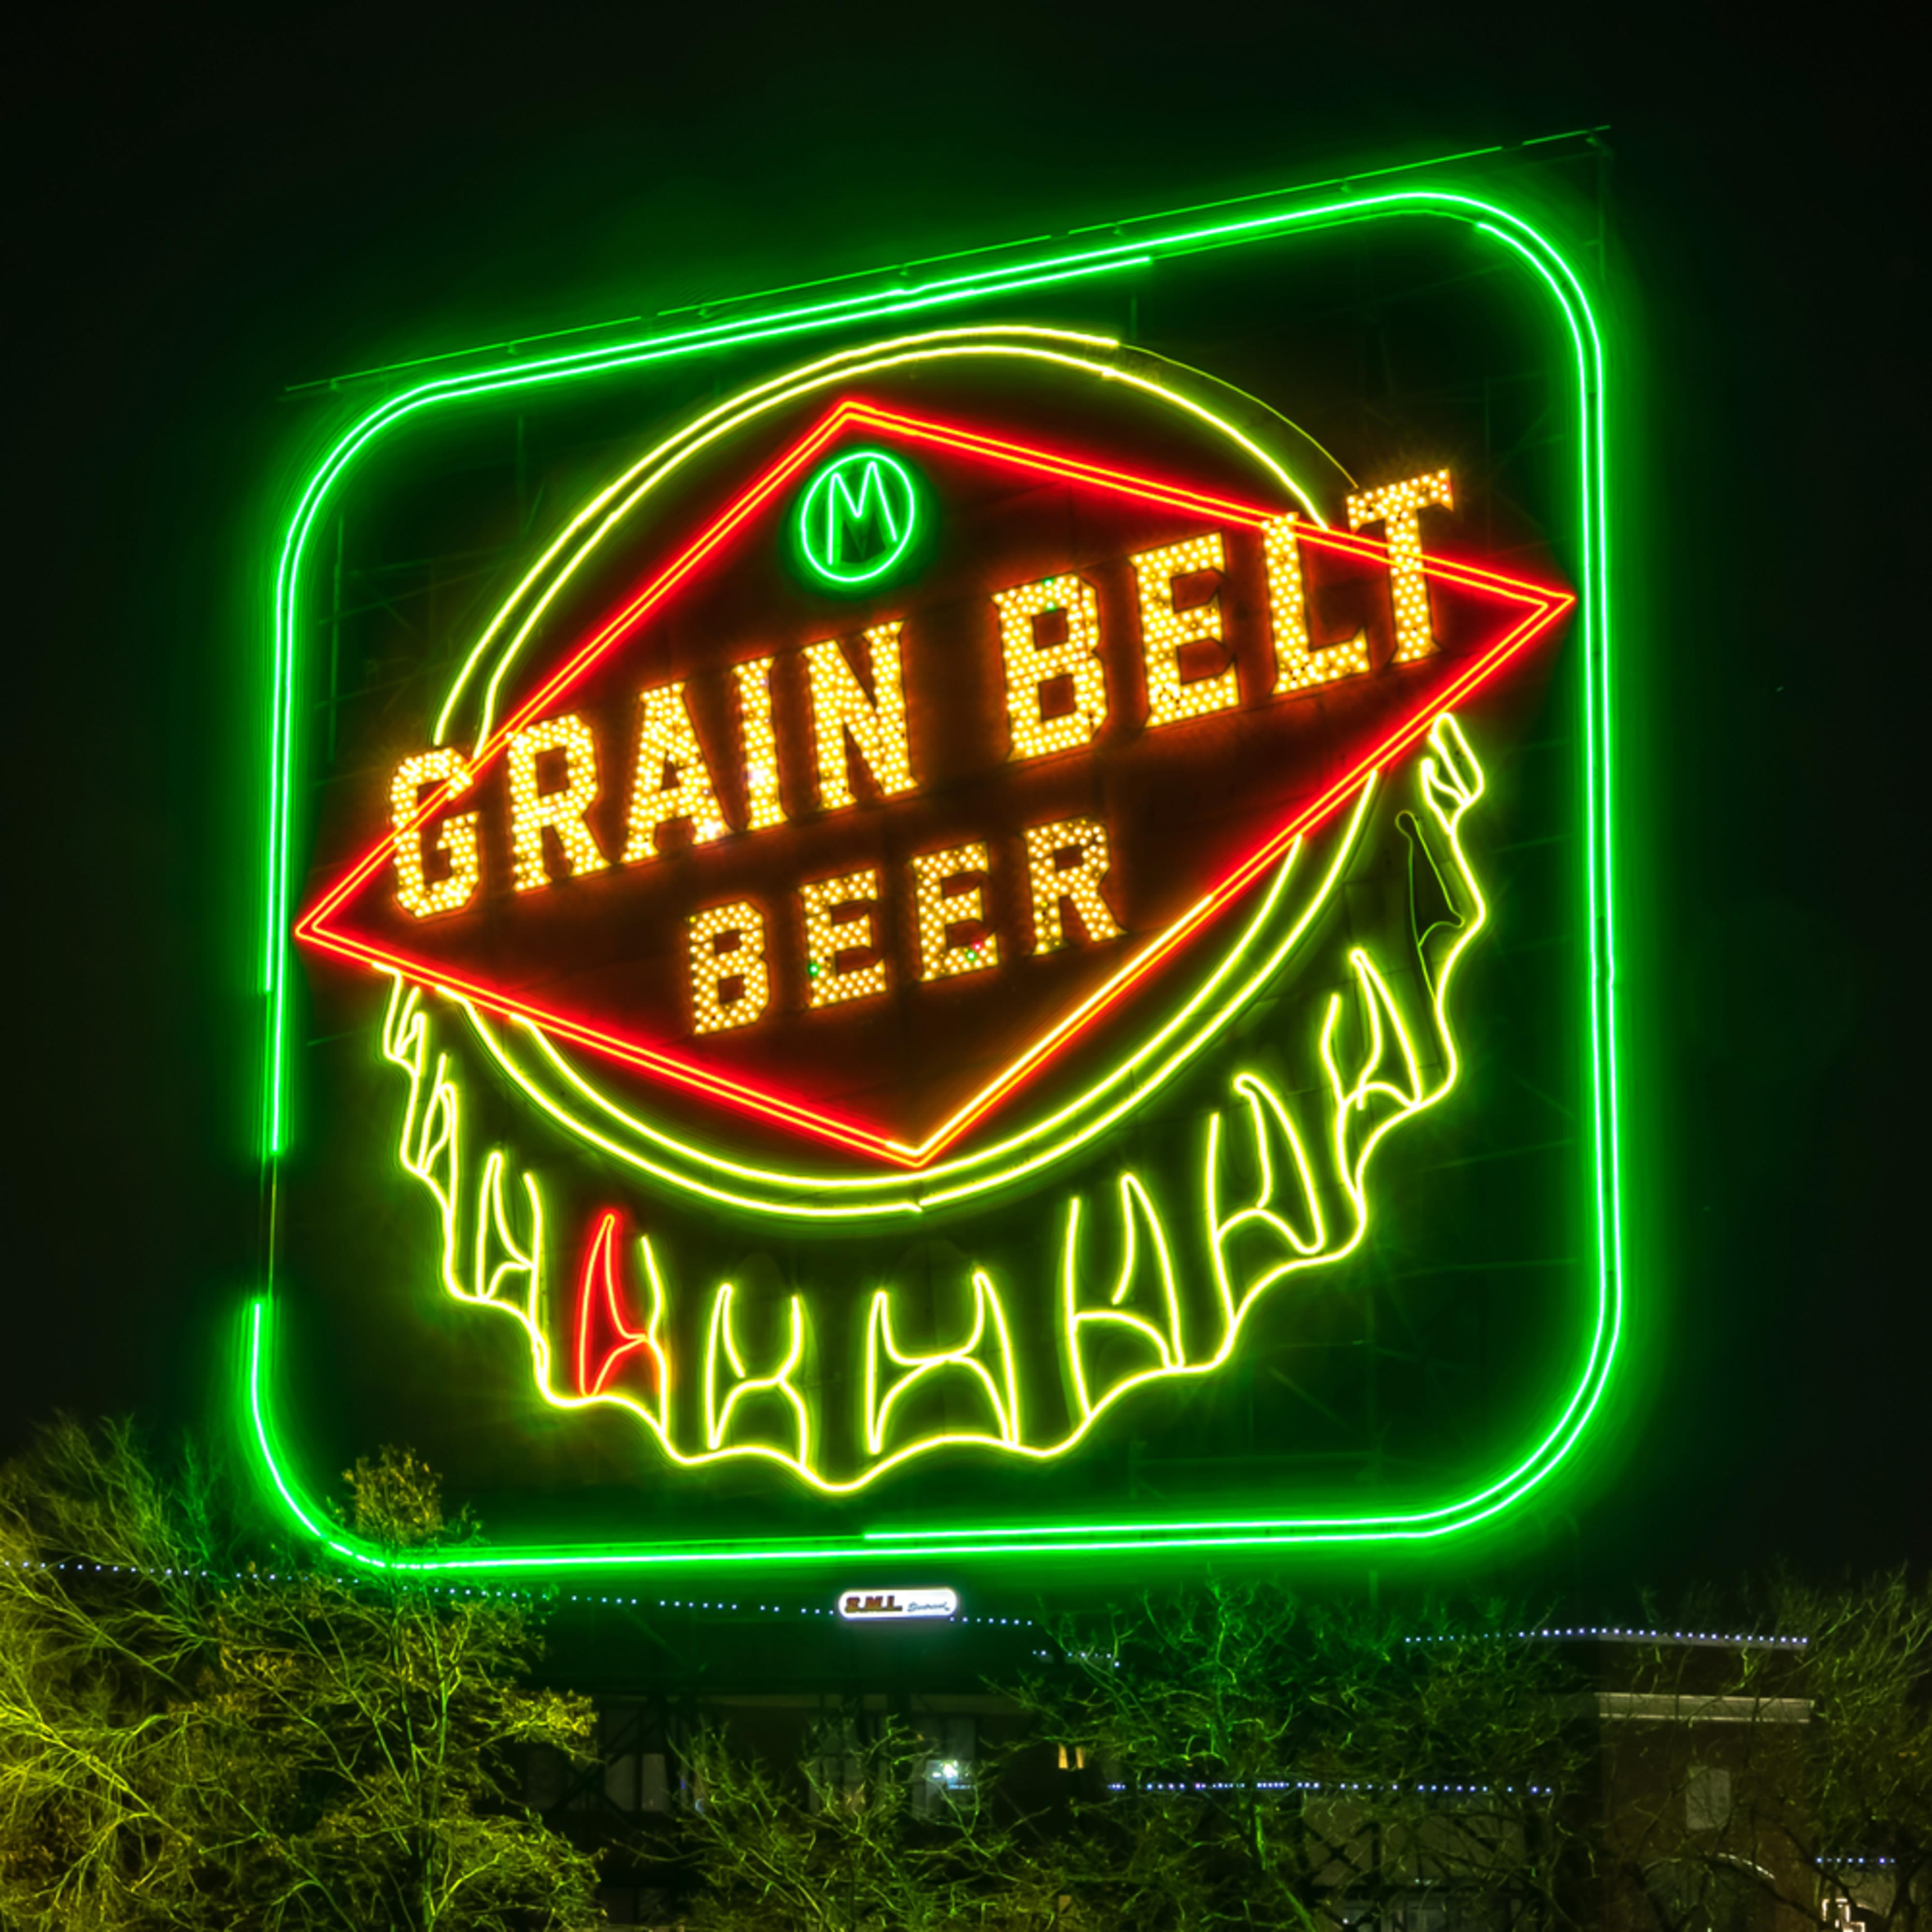 Grain belt sign hdjtoy